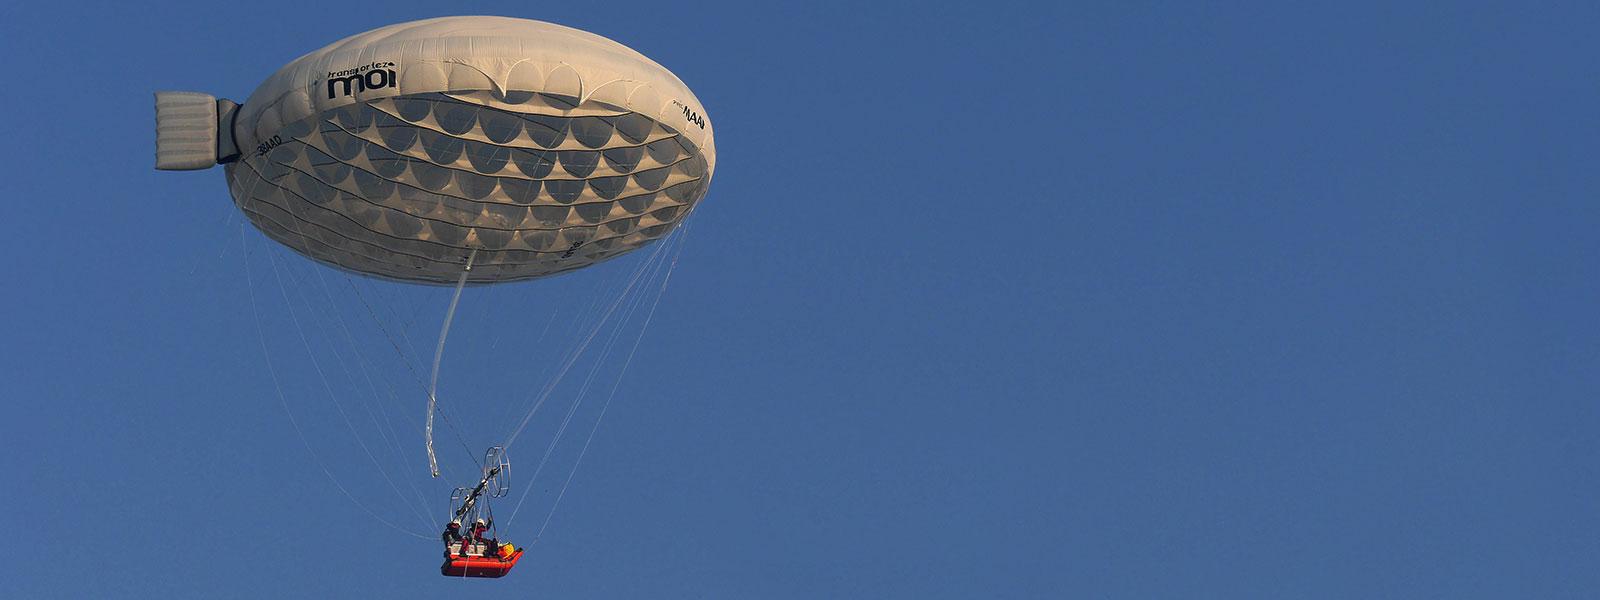 2015_Aerospace_traversee_Manche_IRIS-CHALLENGER-TRANSOCEANS-5-1600x600